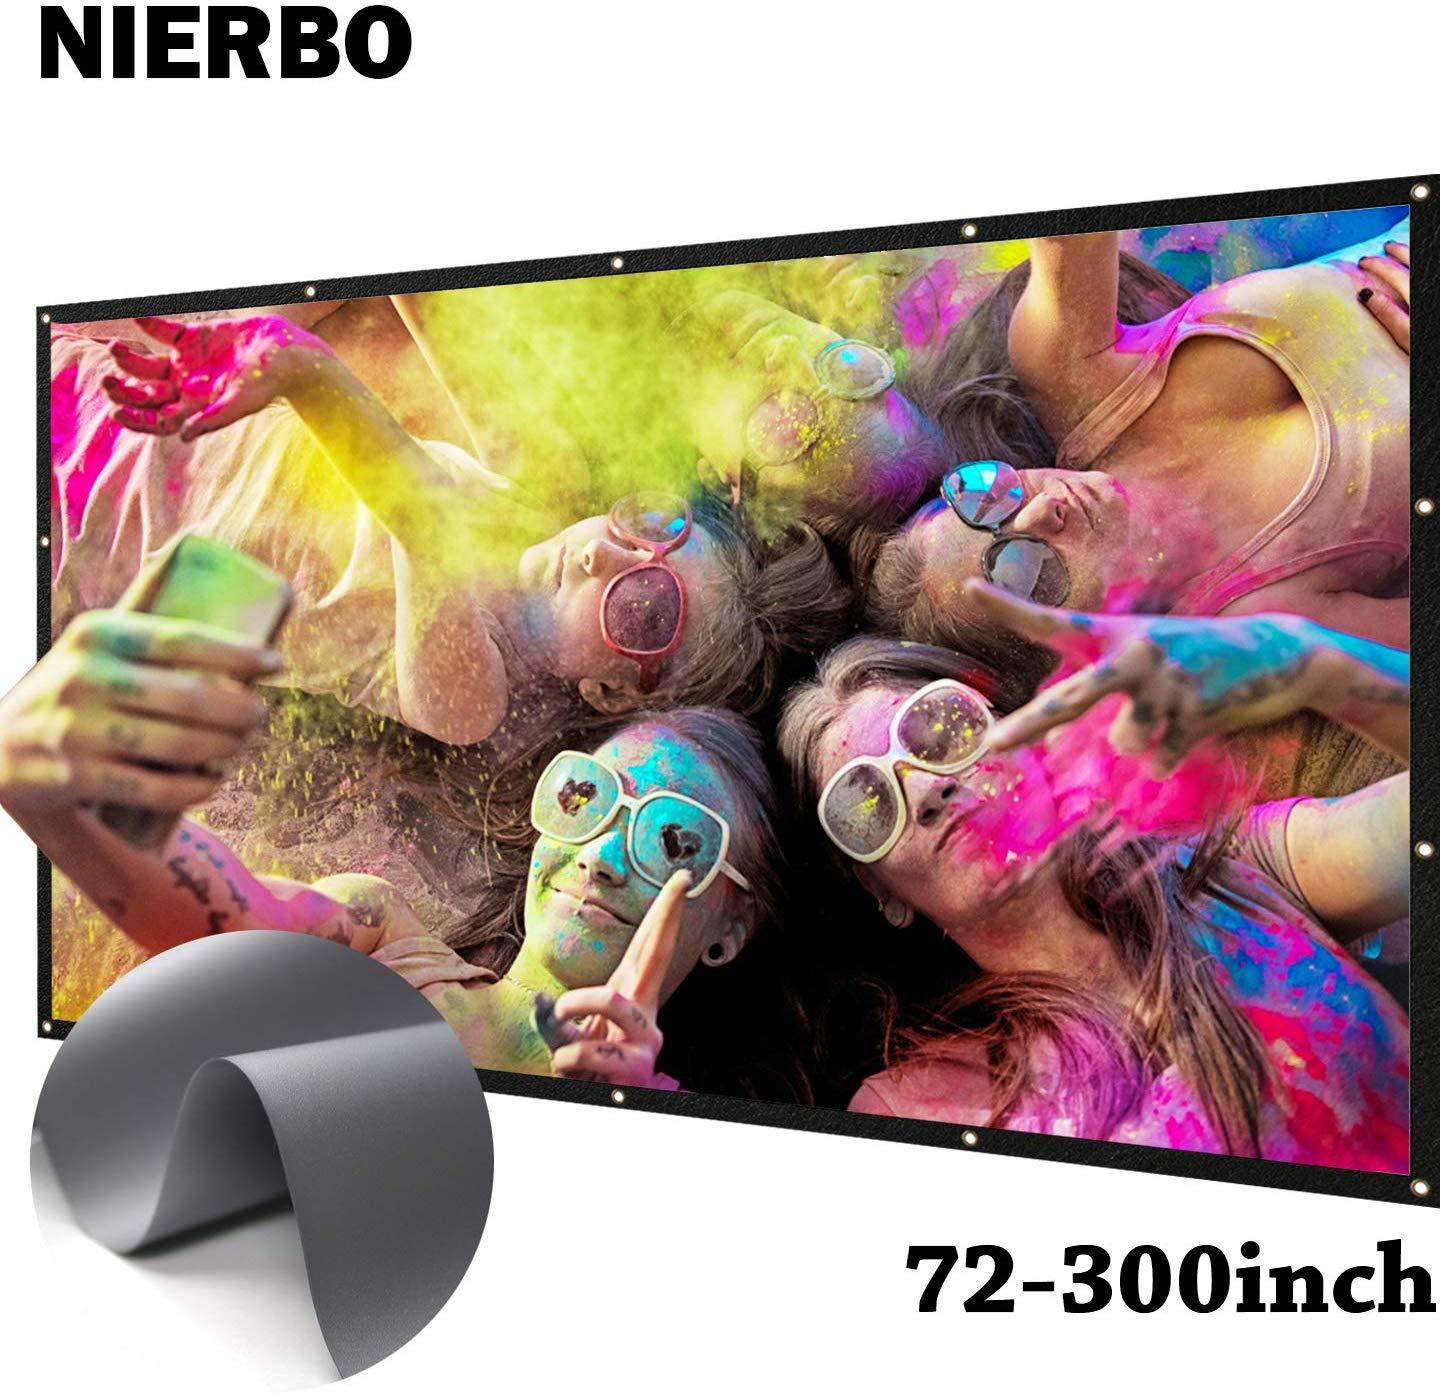 NIERBO Metal Silver Projection Screen